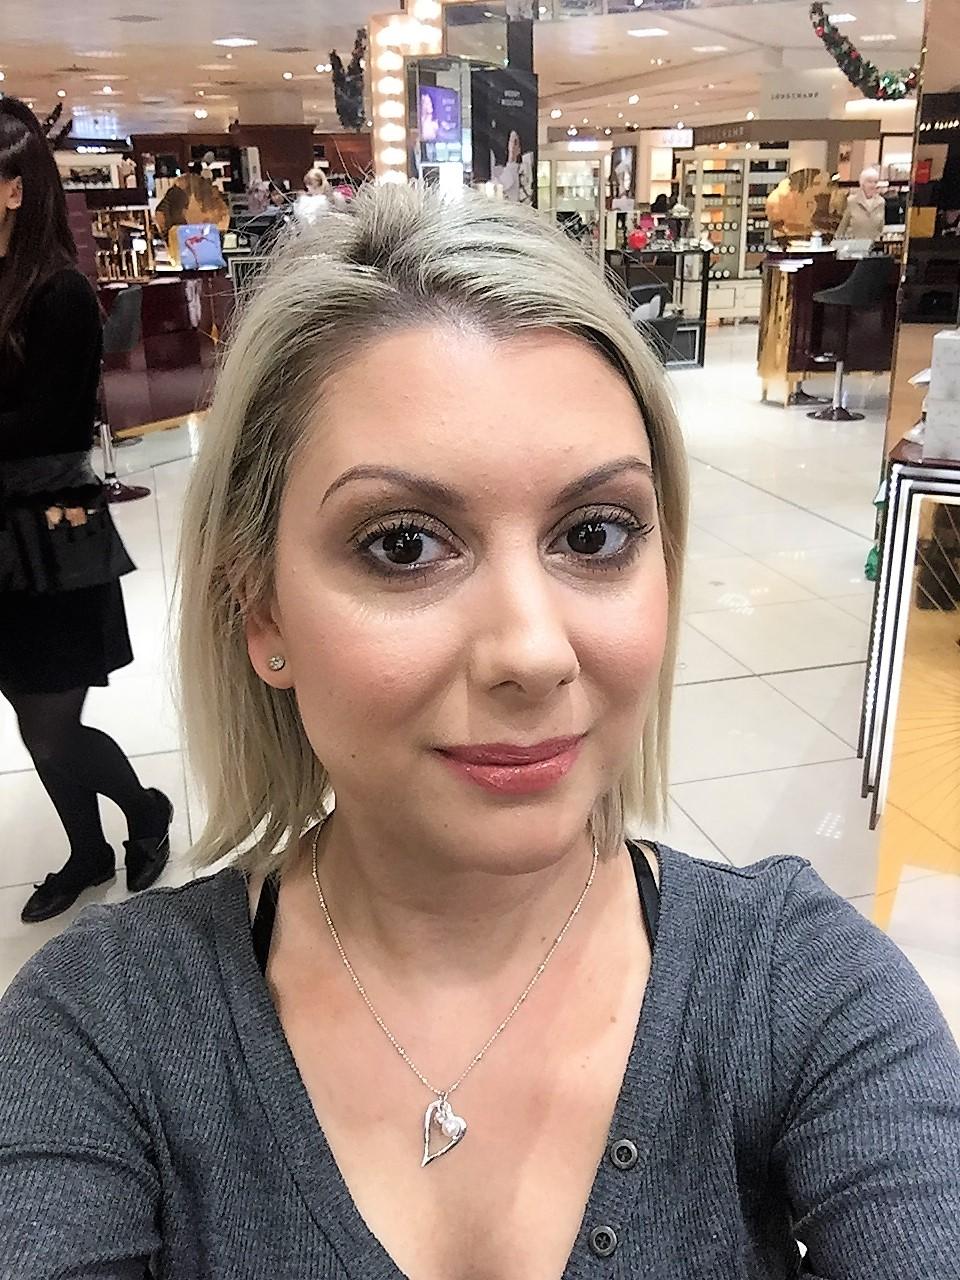 Shaz Saed -- Blonde Tea Party -- www.blonde-tea-party.com -- beauty and makeup tips -- charlotte tilbury--kingston bentalls -- magic foundation--golden goddess--glamerous makeup look--